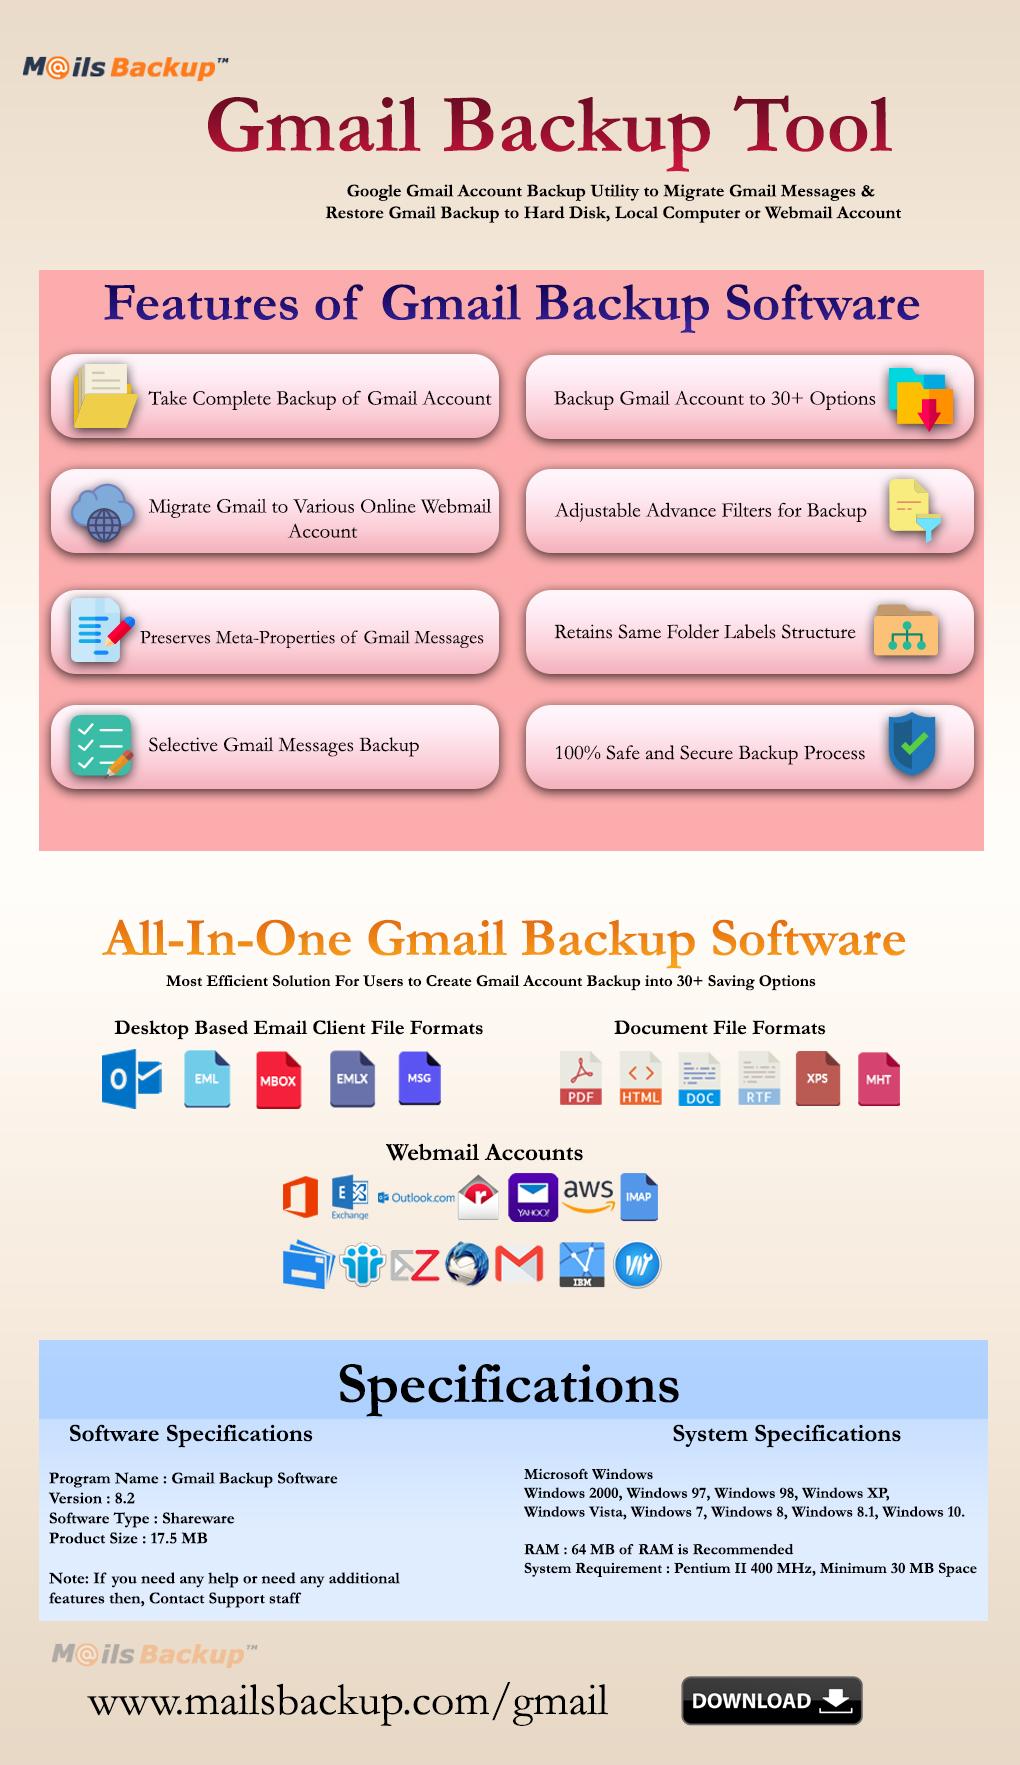 [Image: gmail-backup-tool.jpg]